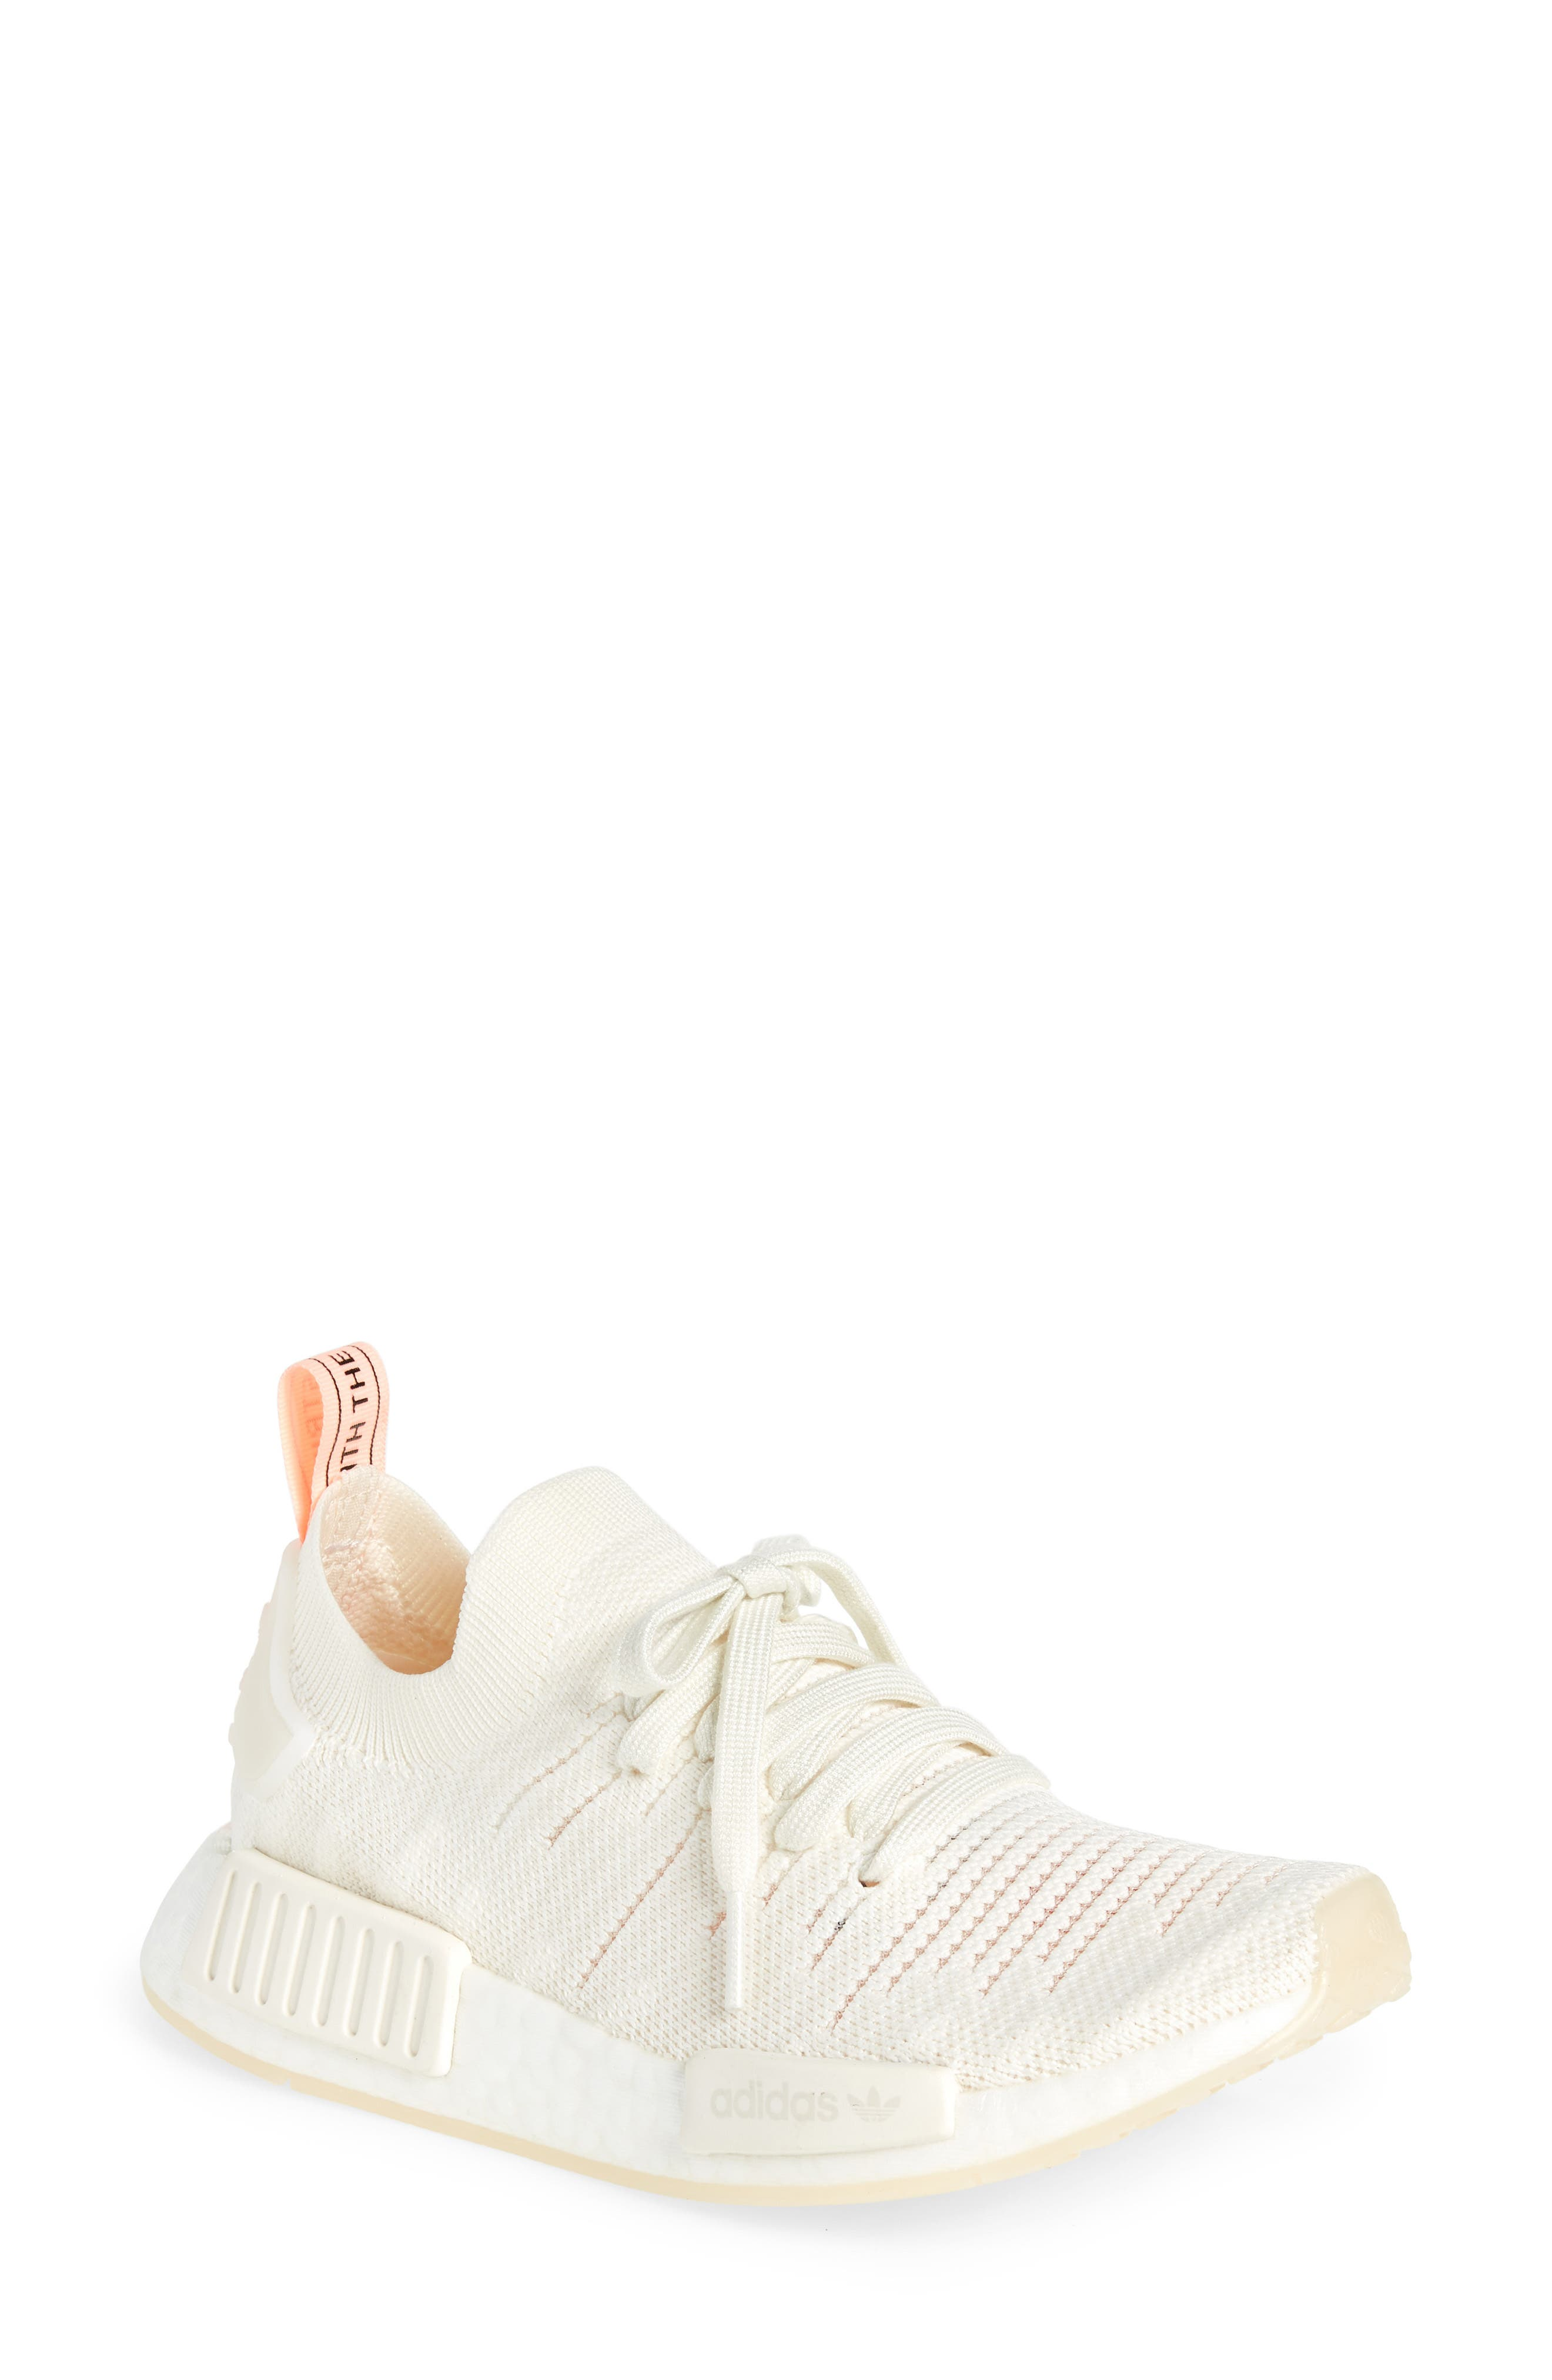 NMD R1 STLT Primeknit Sneaker, Main, color, 100